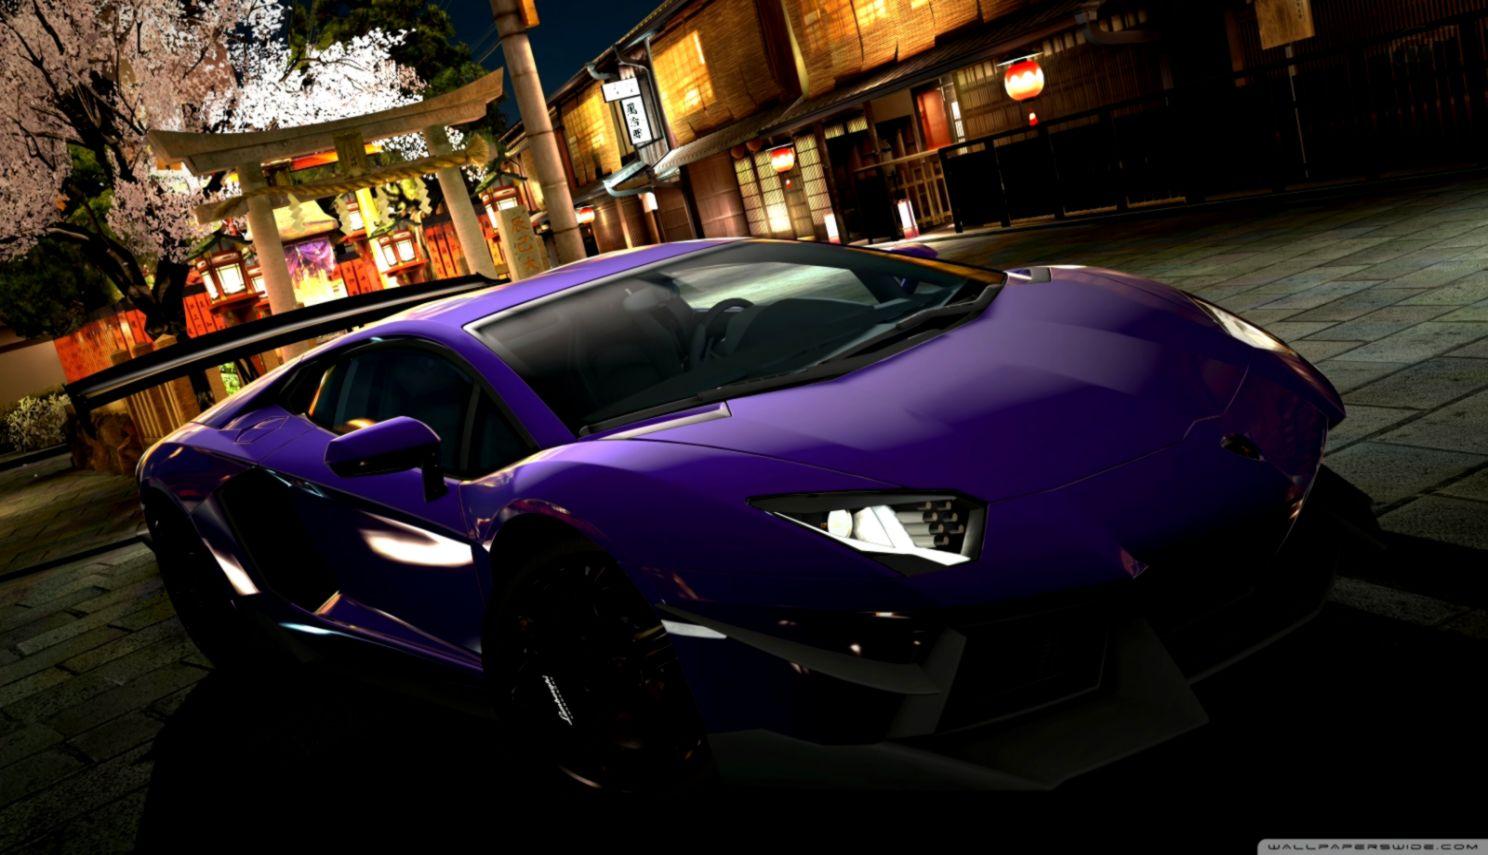 Lamborghini Aventador Wallpaper Hd Widescreen Wallpapers